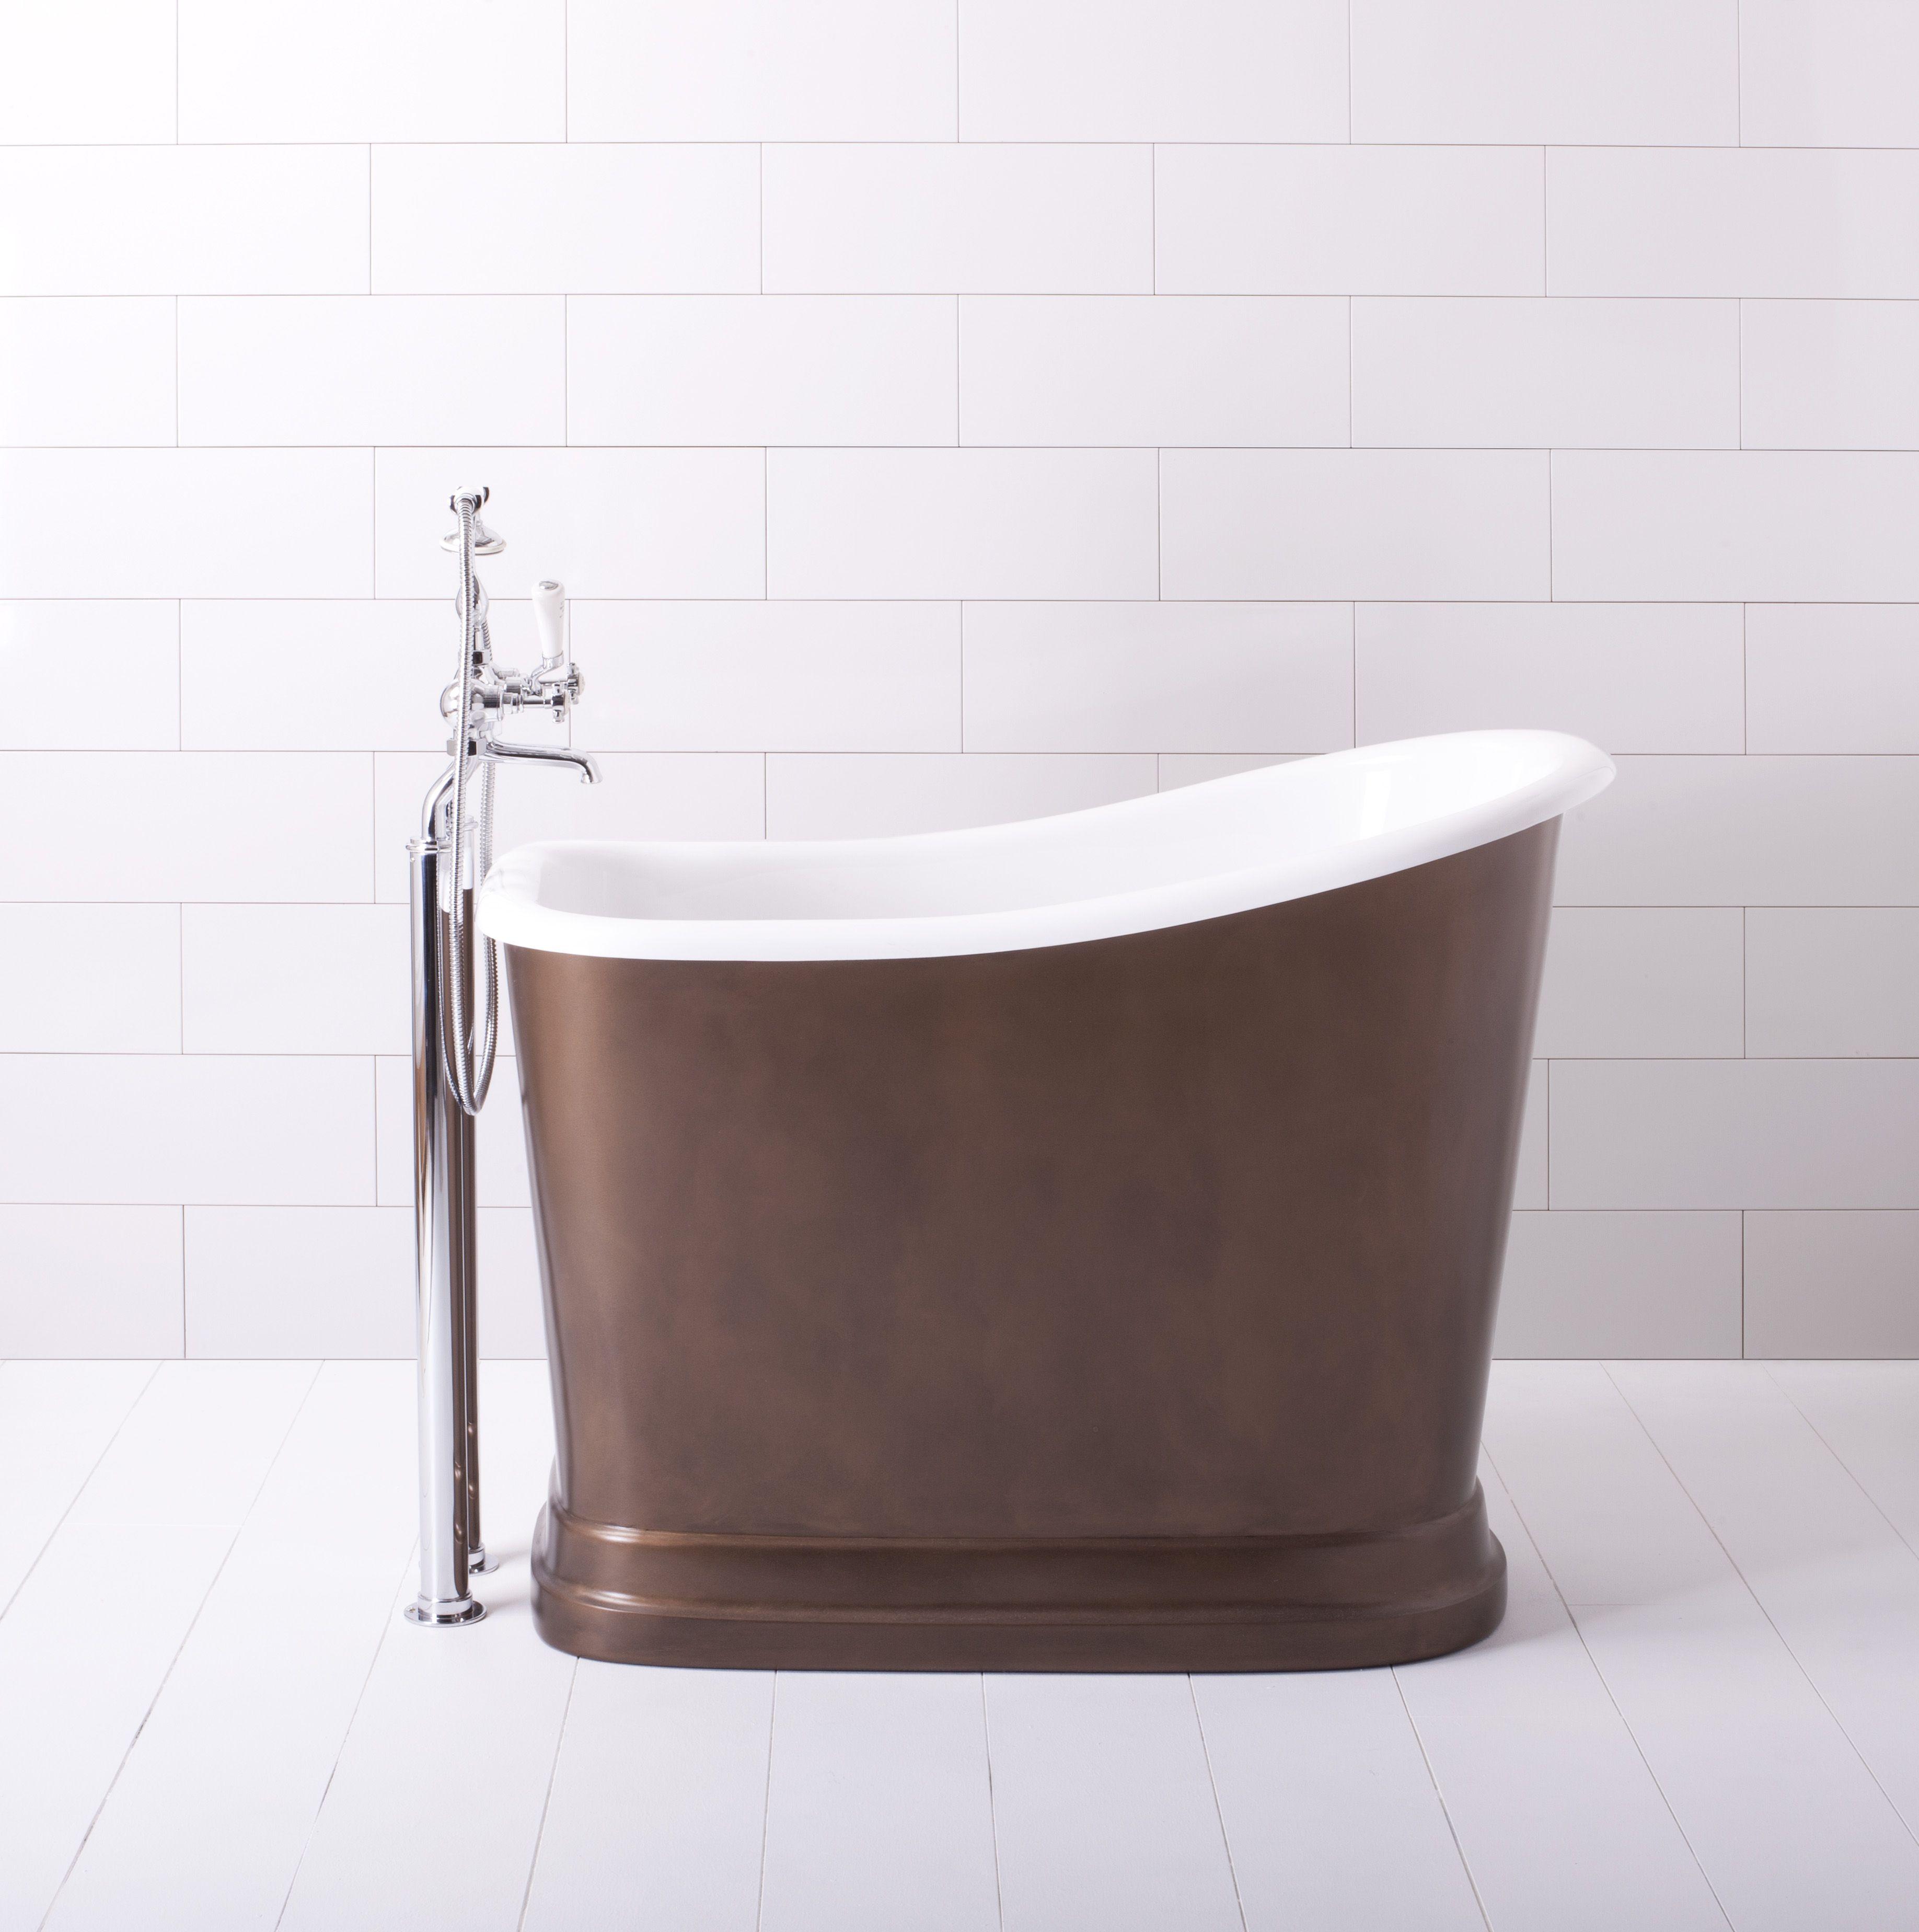 Need A Tub Option For The Master Bathshowerdeep Soaking Tubs Unique Small Bathroom Tubs Design Decoration